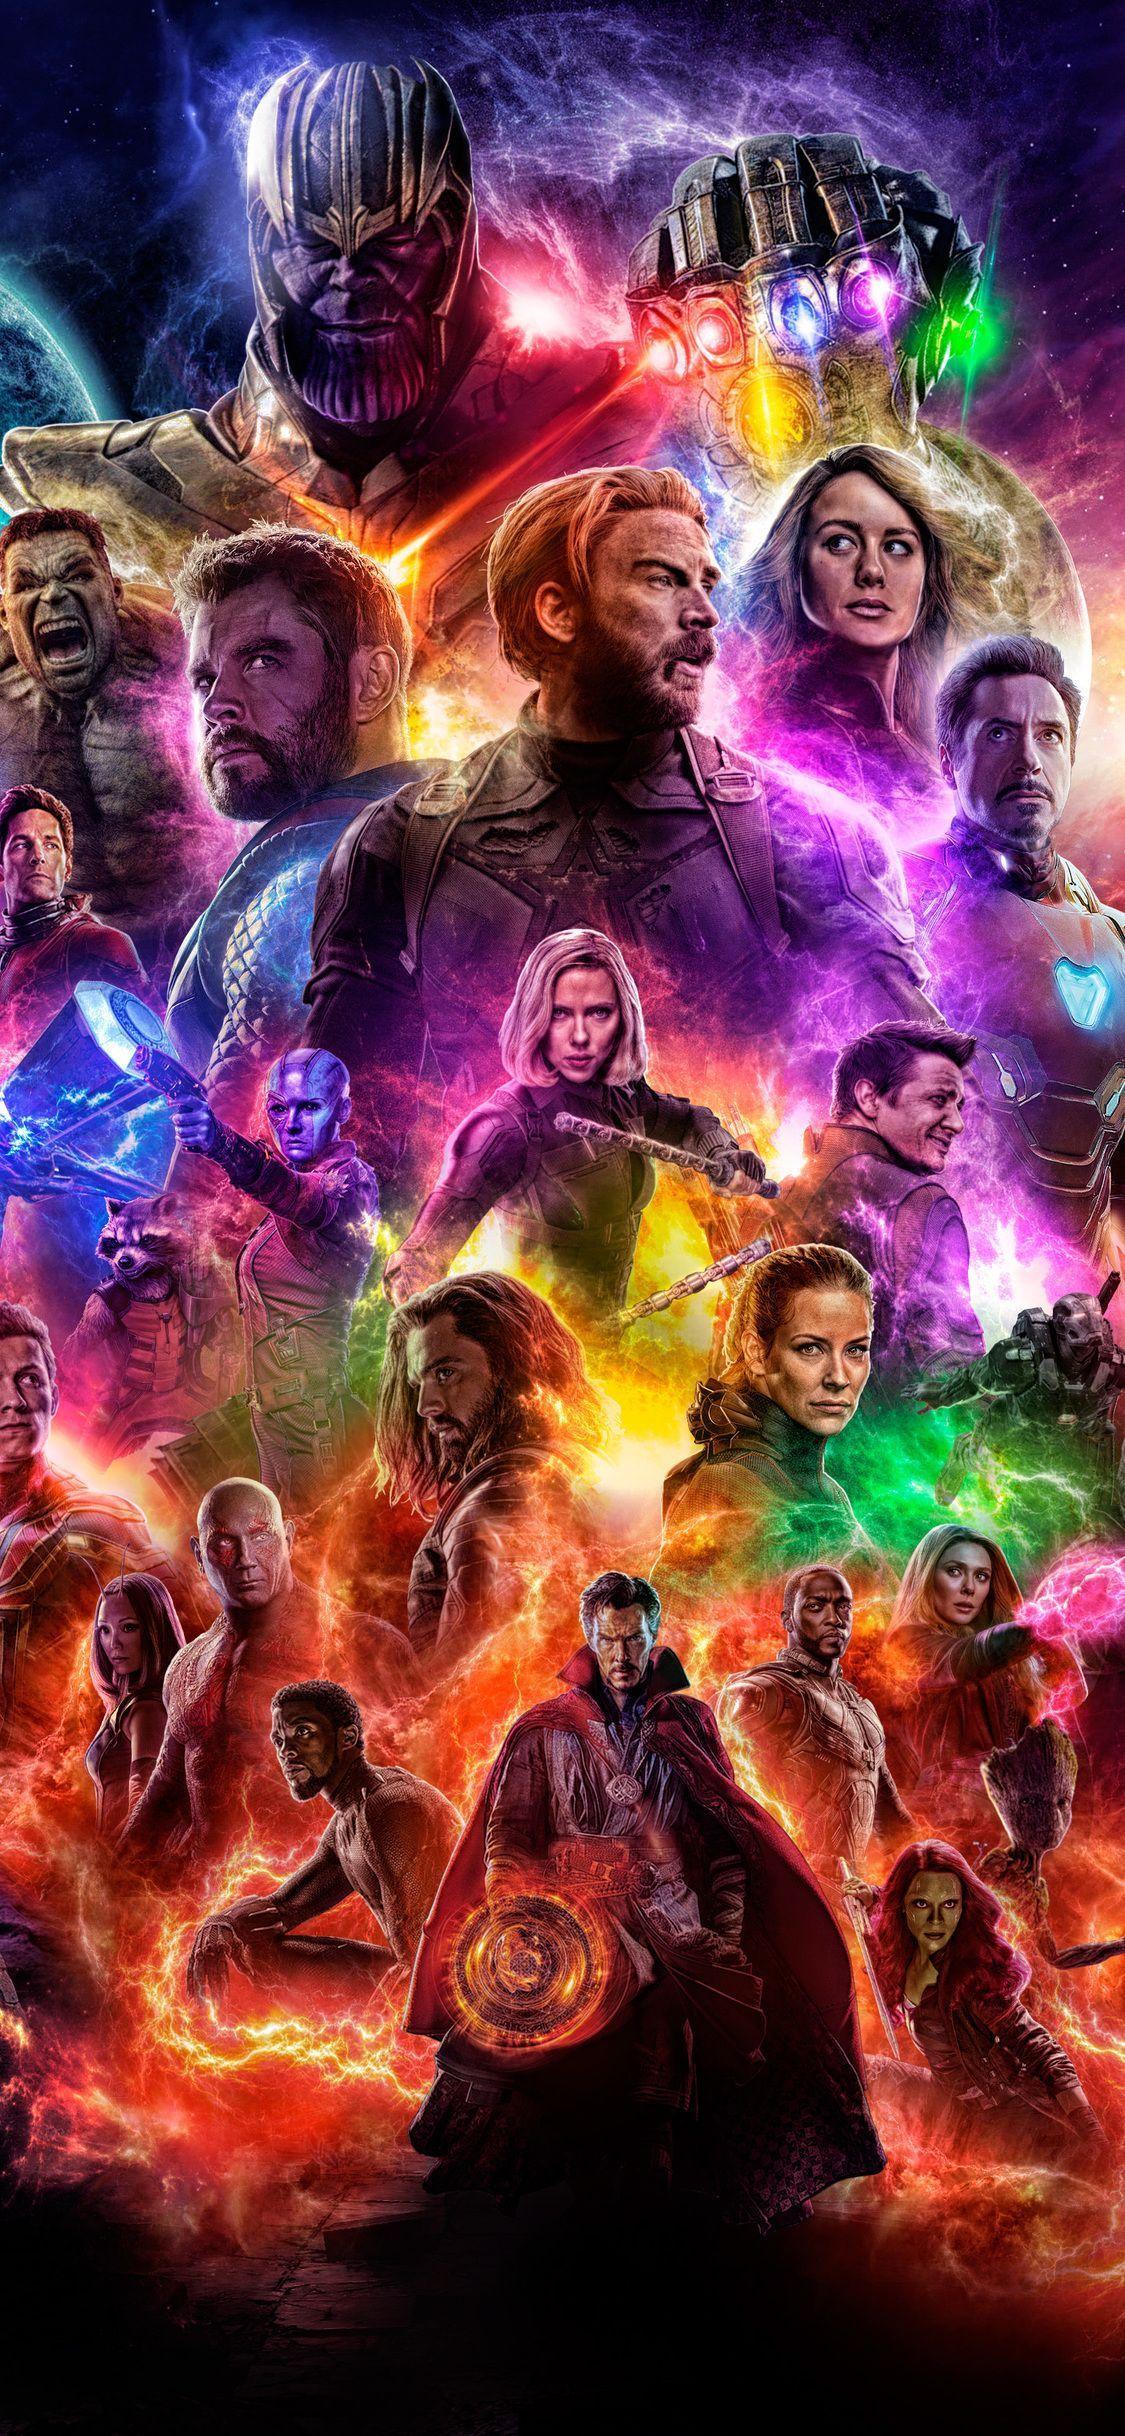 Iphone Xs Max Avengers Wallpaper : iphone, avengers, wallpaper, Avengers, Endgame, IPhone, Wallpapers, Backgrounds, WallpaperAccess